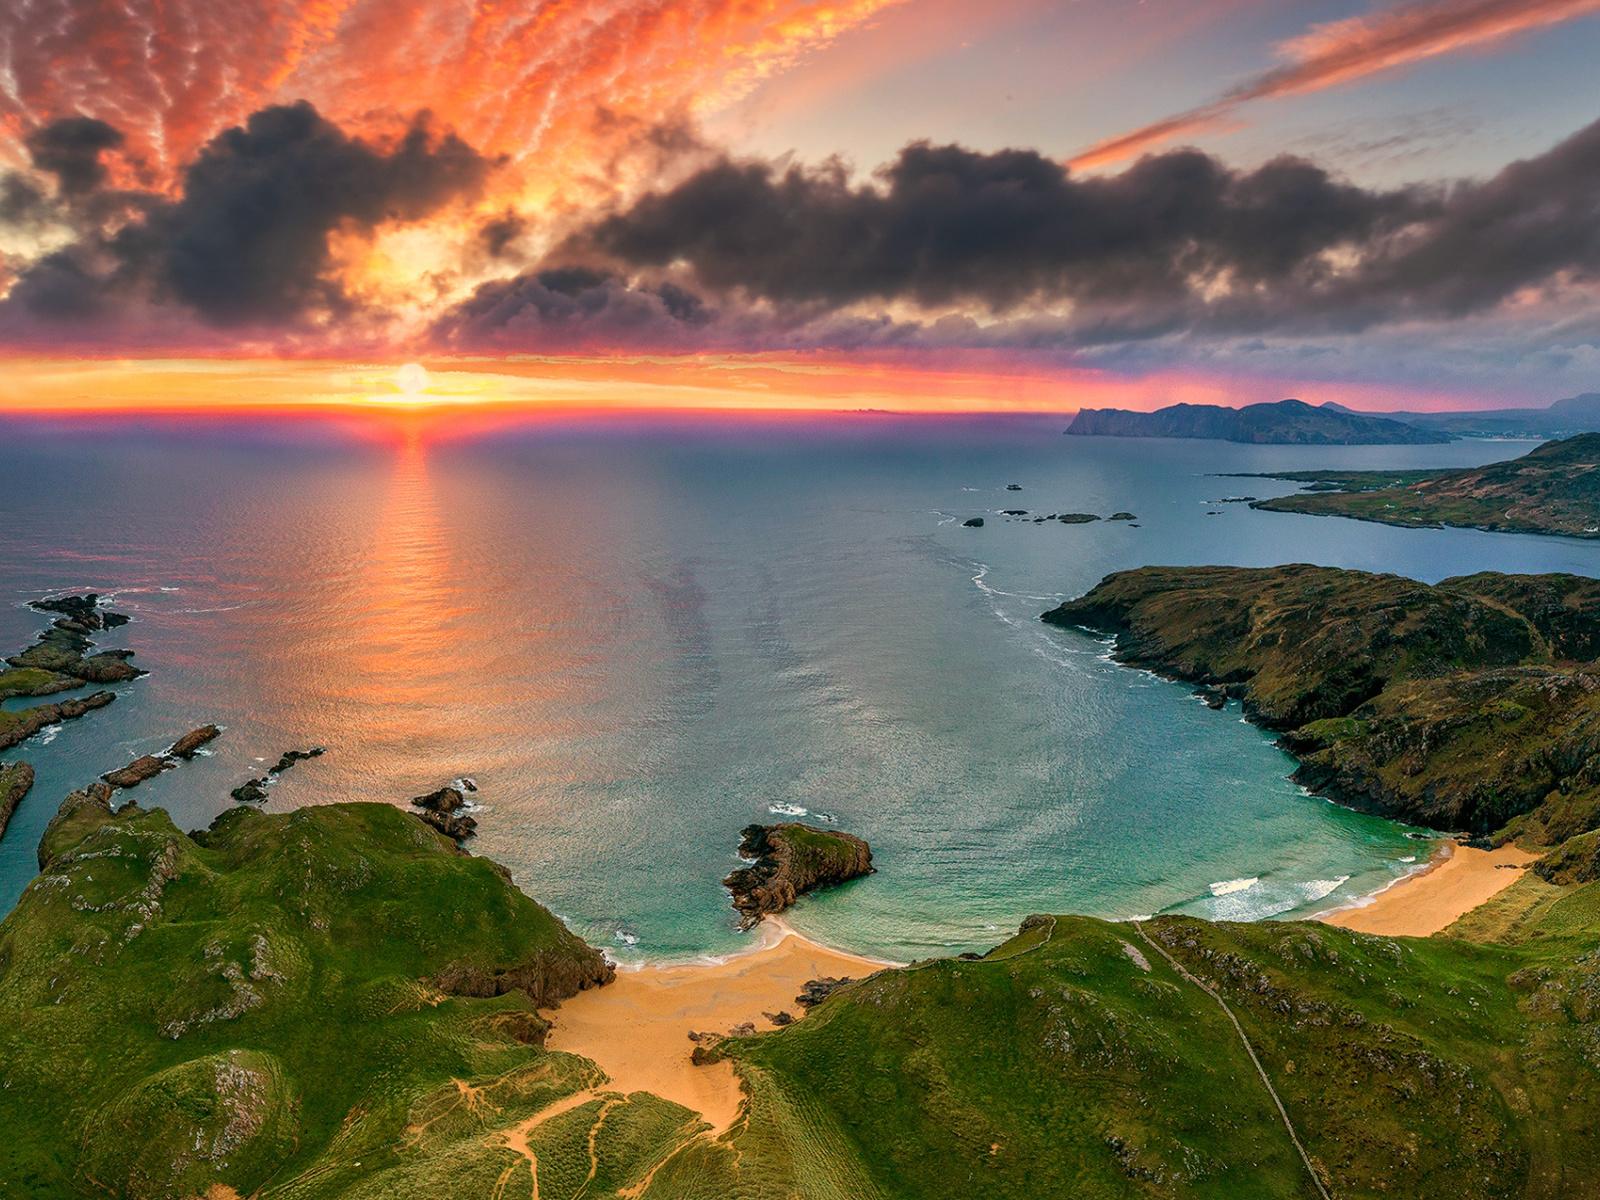 пейзаж, берег, море, небо, вечер